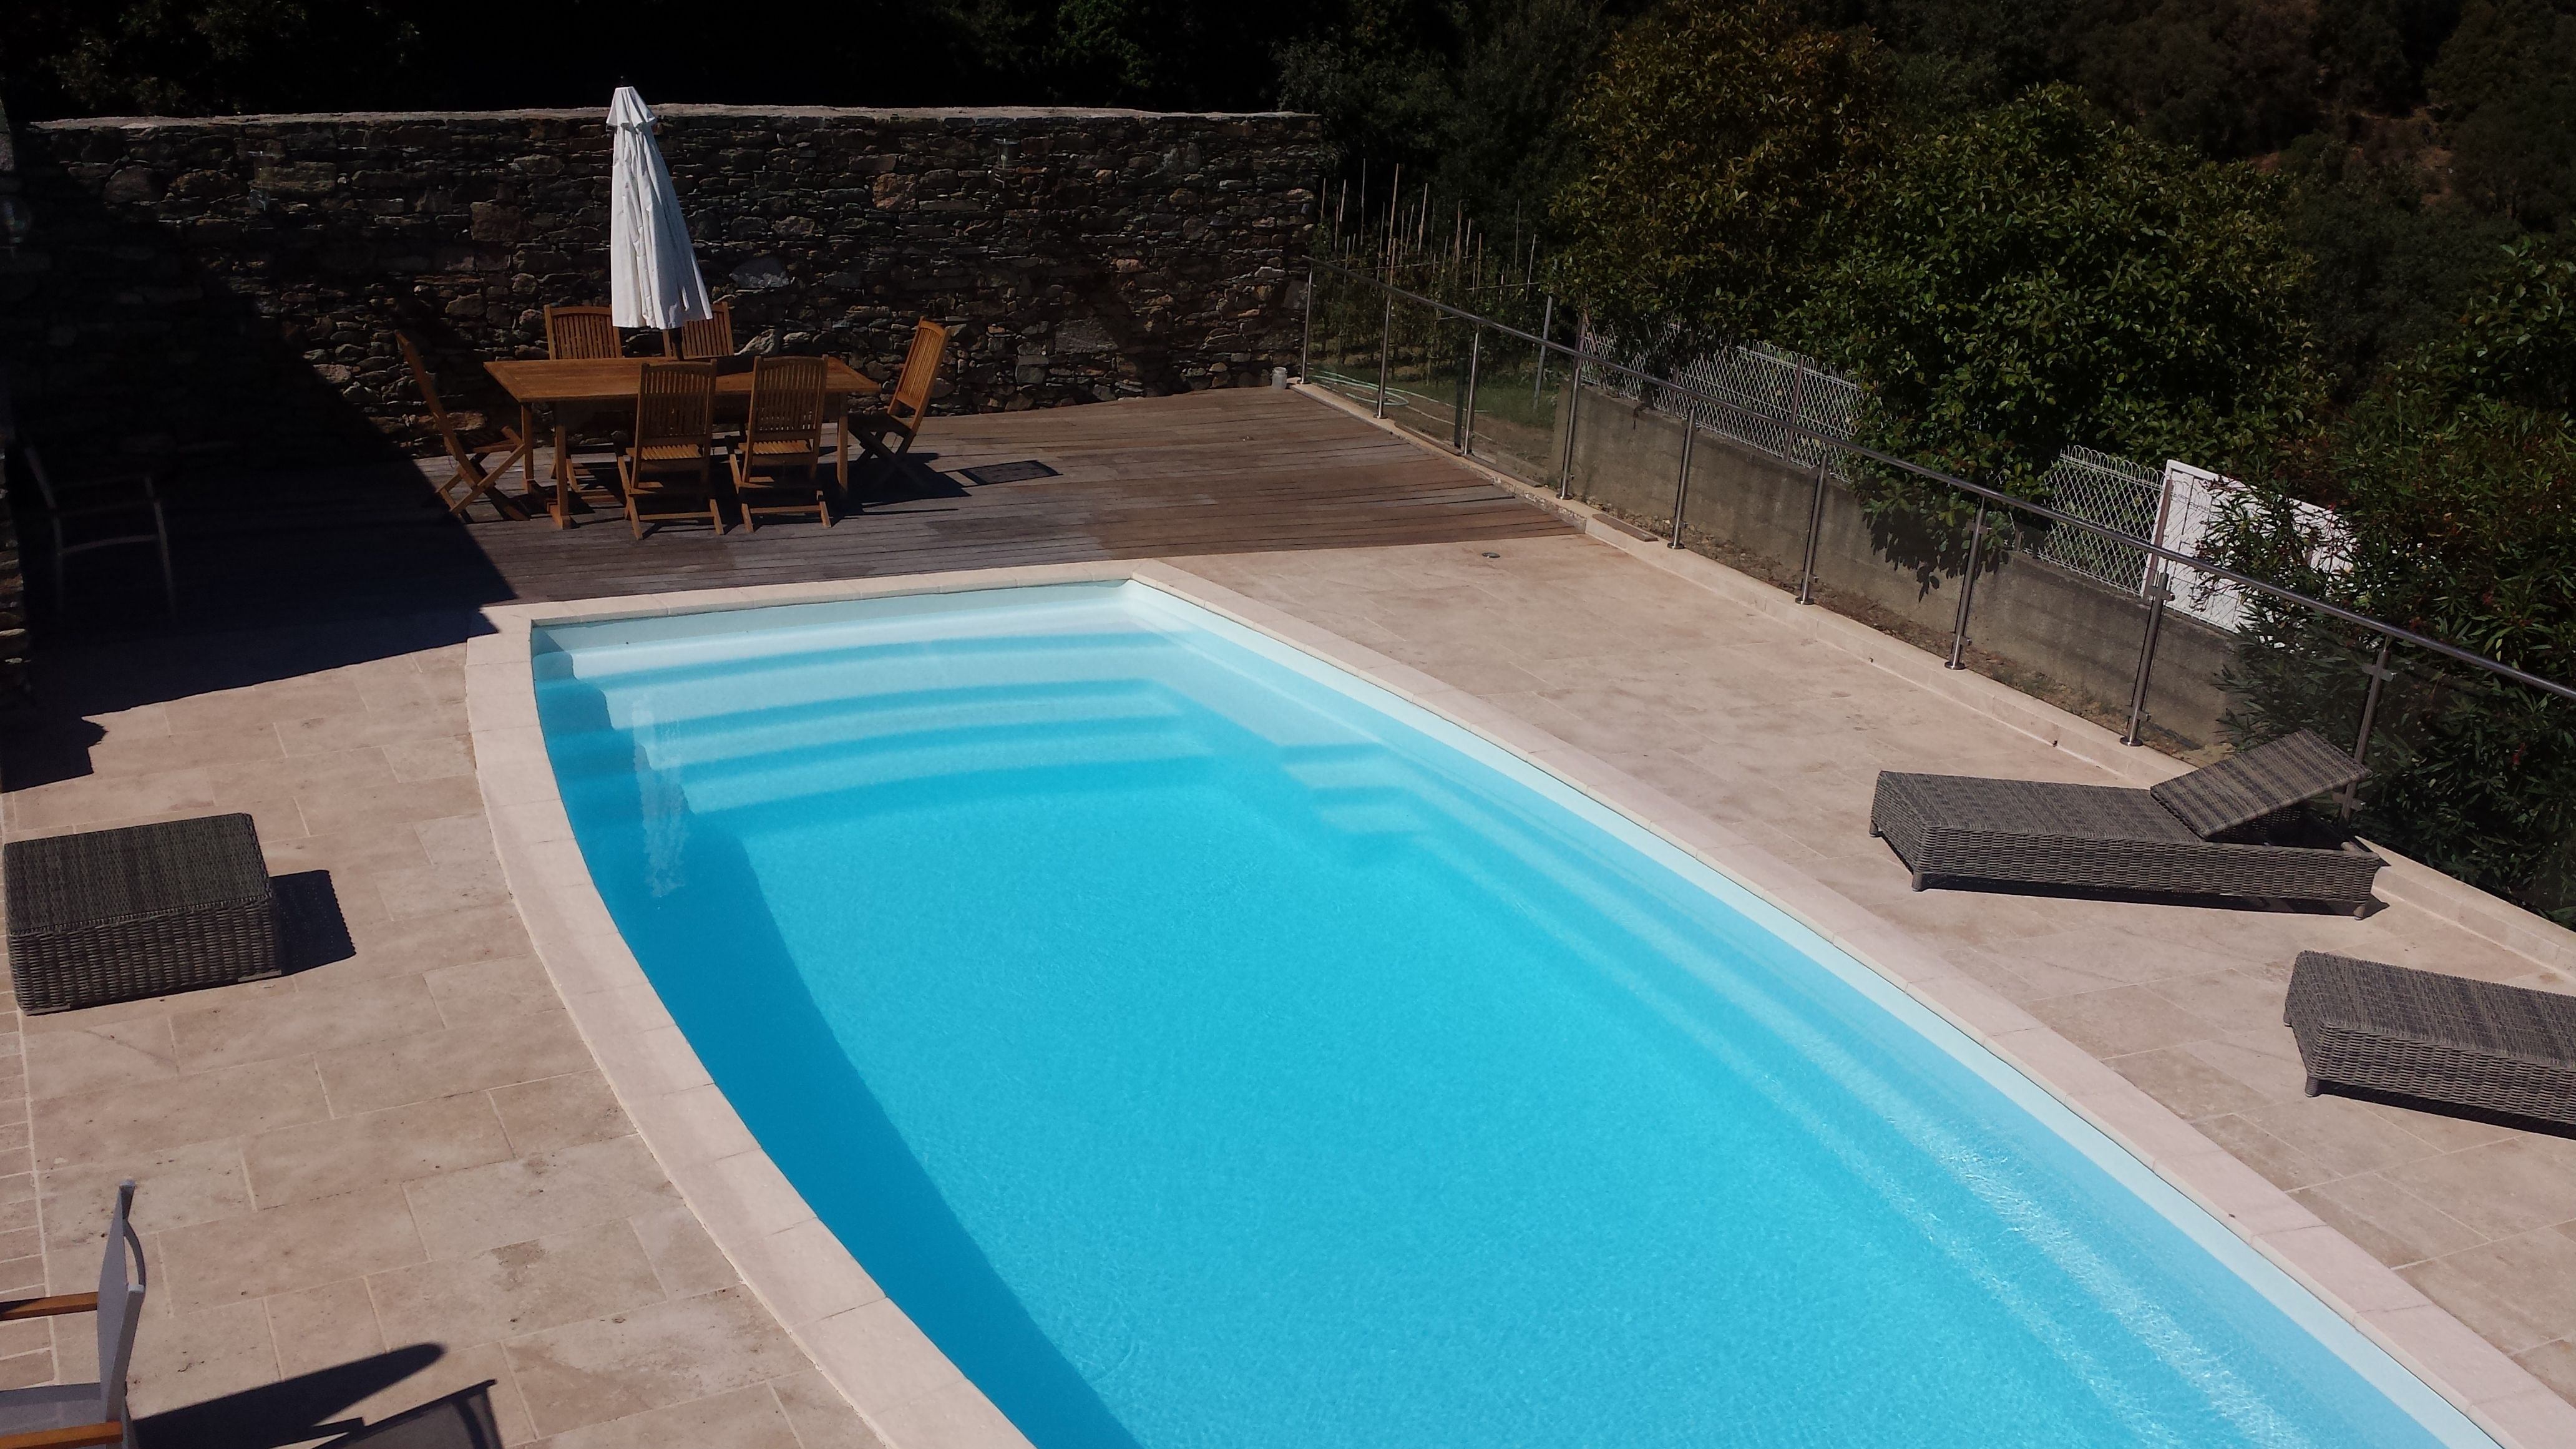 Plage de piscine compos e de dallage en pierre naturelle - Plage piscine pierre naturelle ...